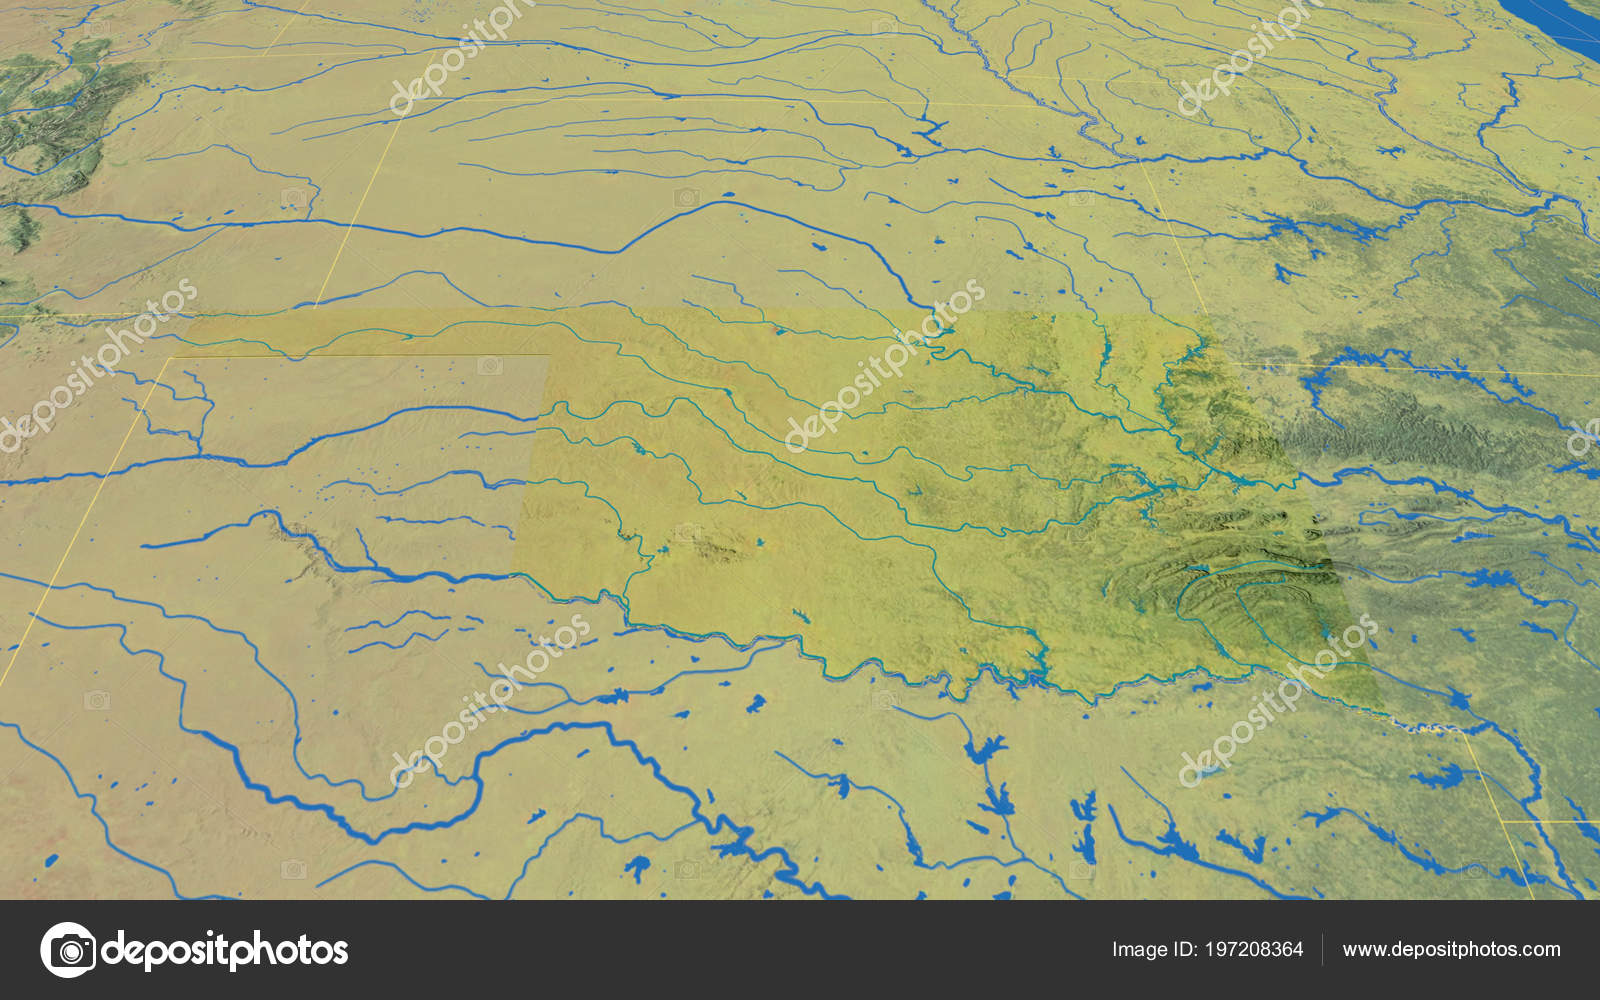 Topographic Map Oklahoma.Oklahoma Region United States Extruded Topographic Map Stock Photo